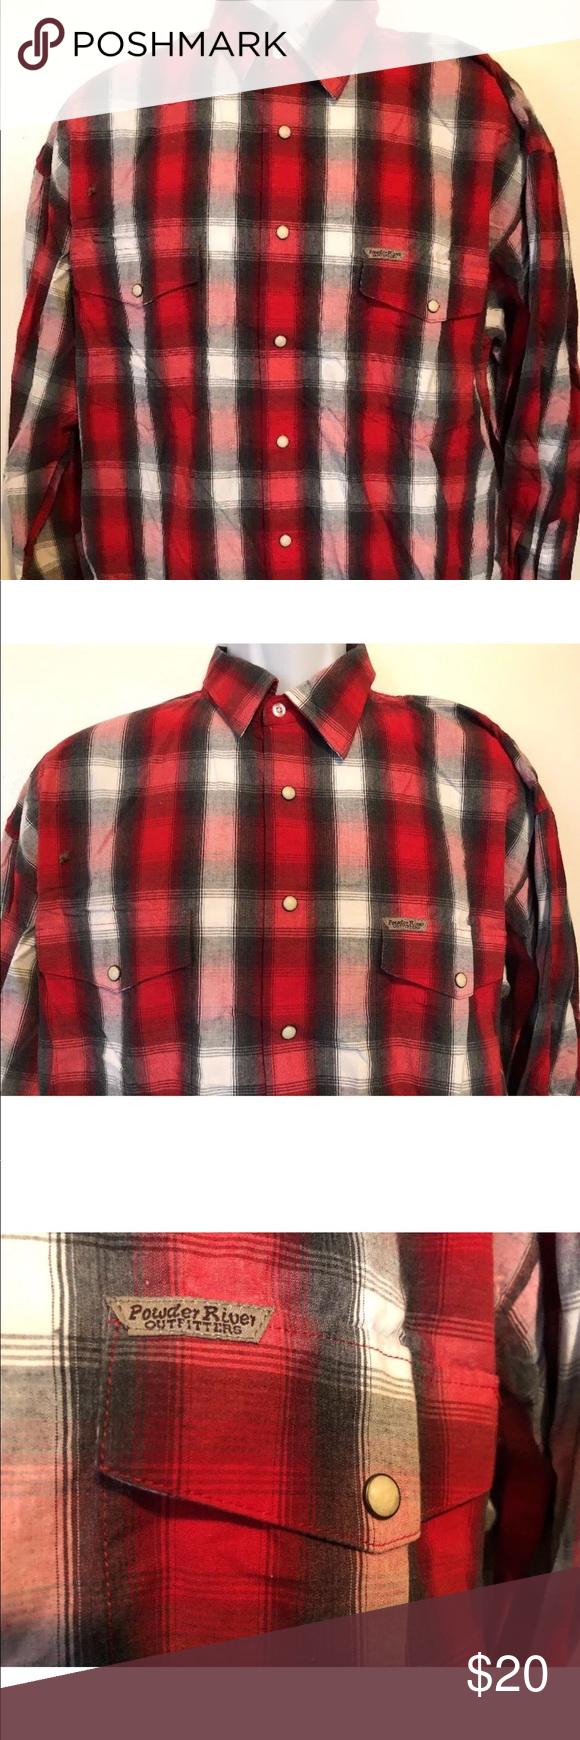 b1dcc43a Clench Mens Buffalo Plaid Flannel Shirt | Top Mode Depot